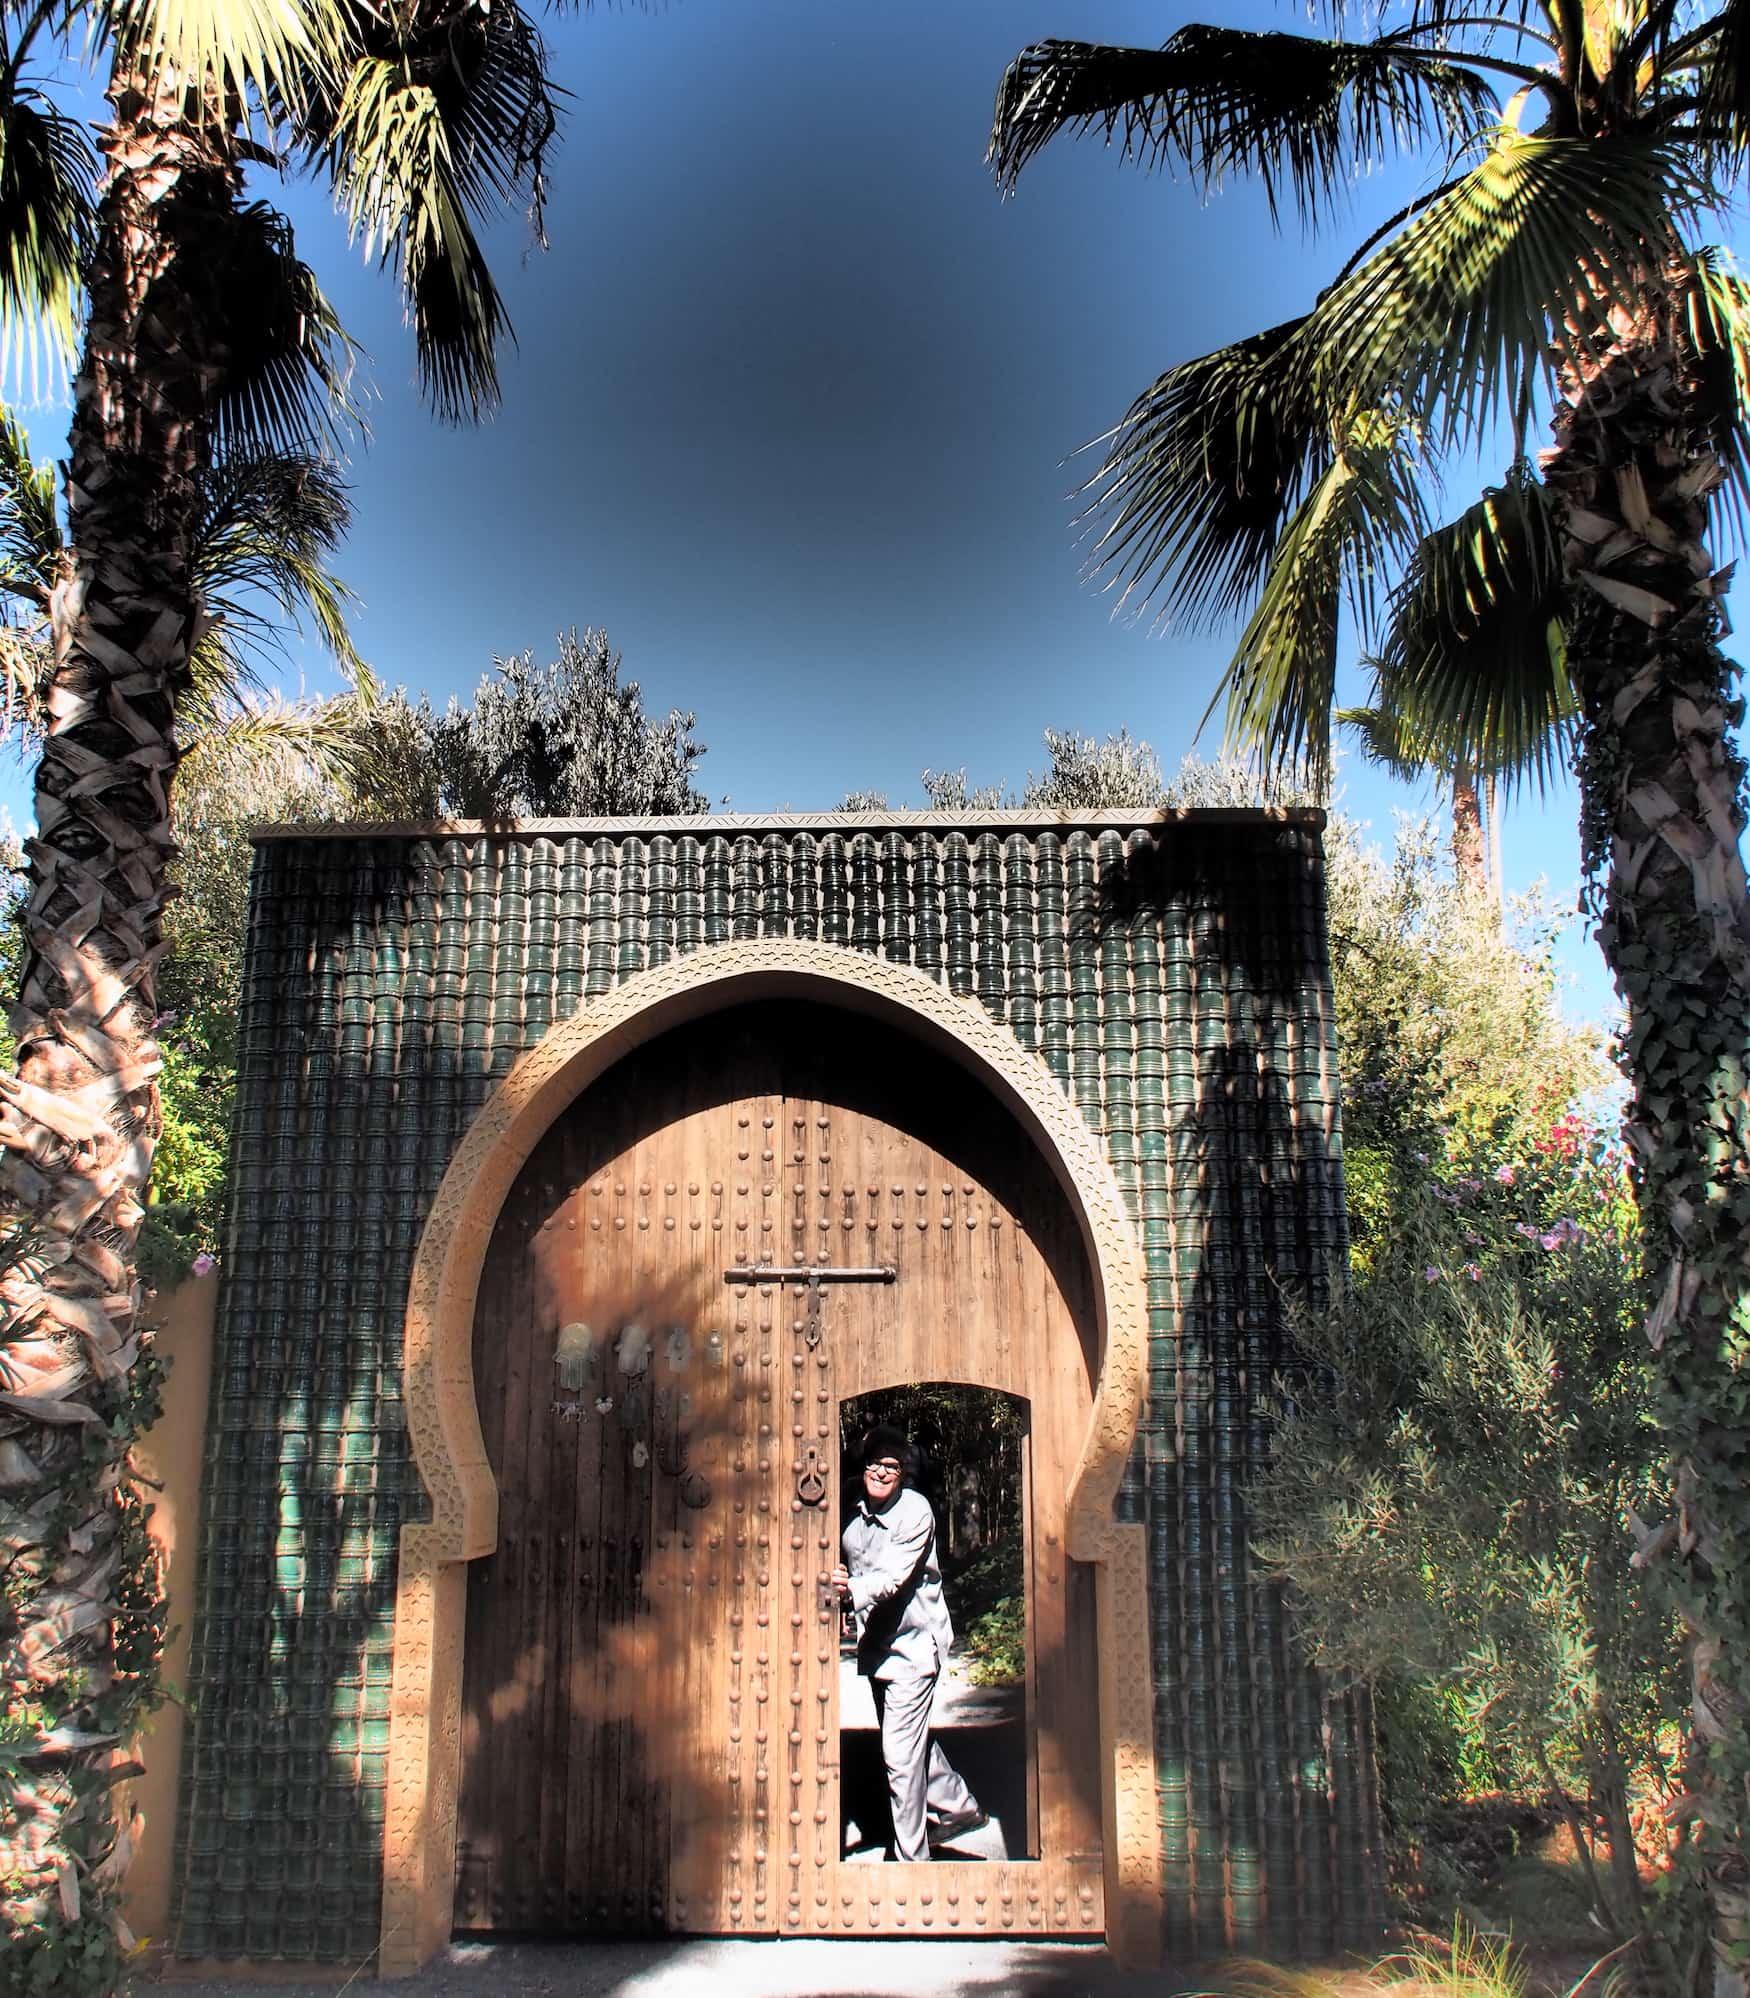 Marrakesch - Kreative - Anima - Garten von Andre Heller